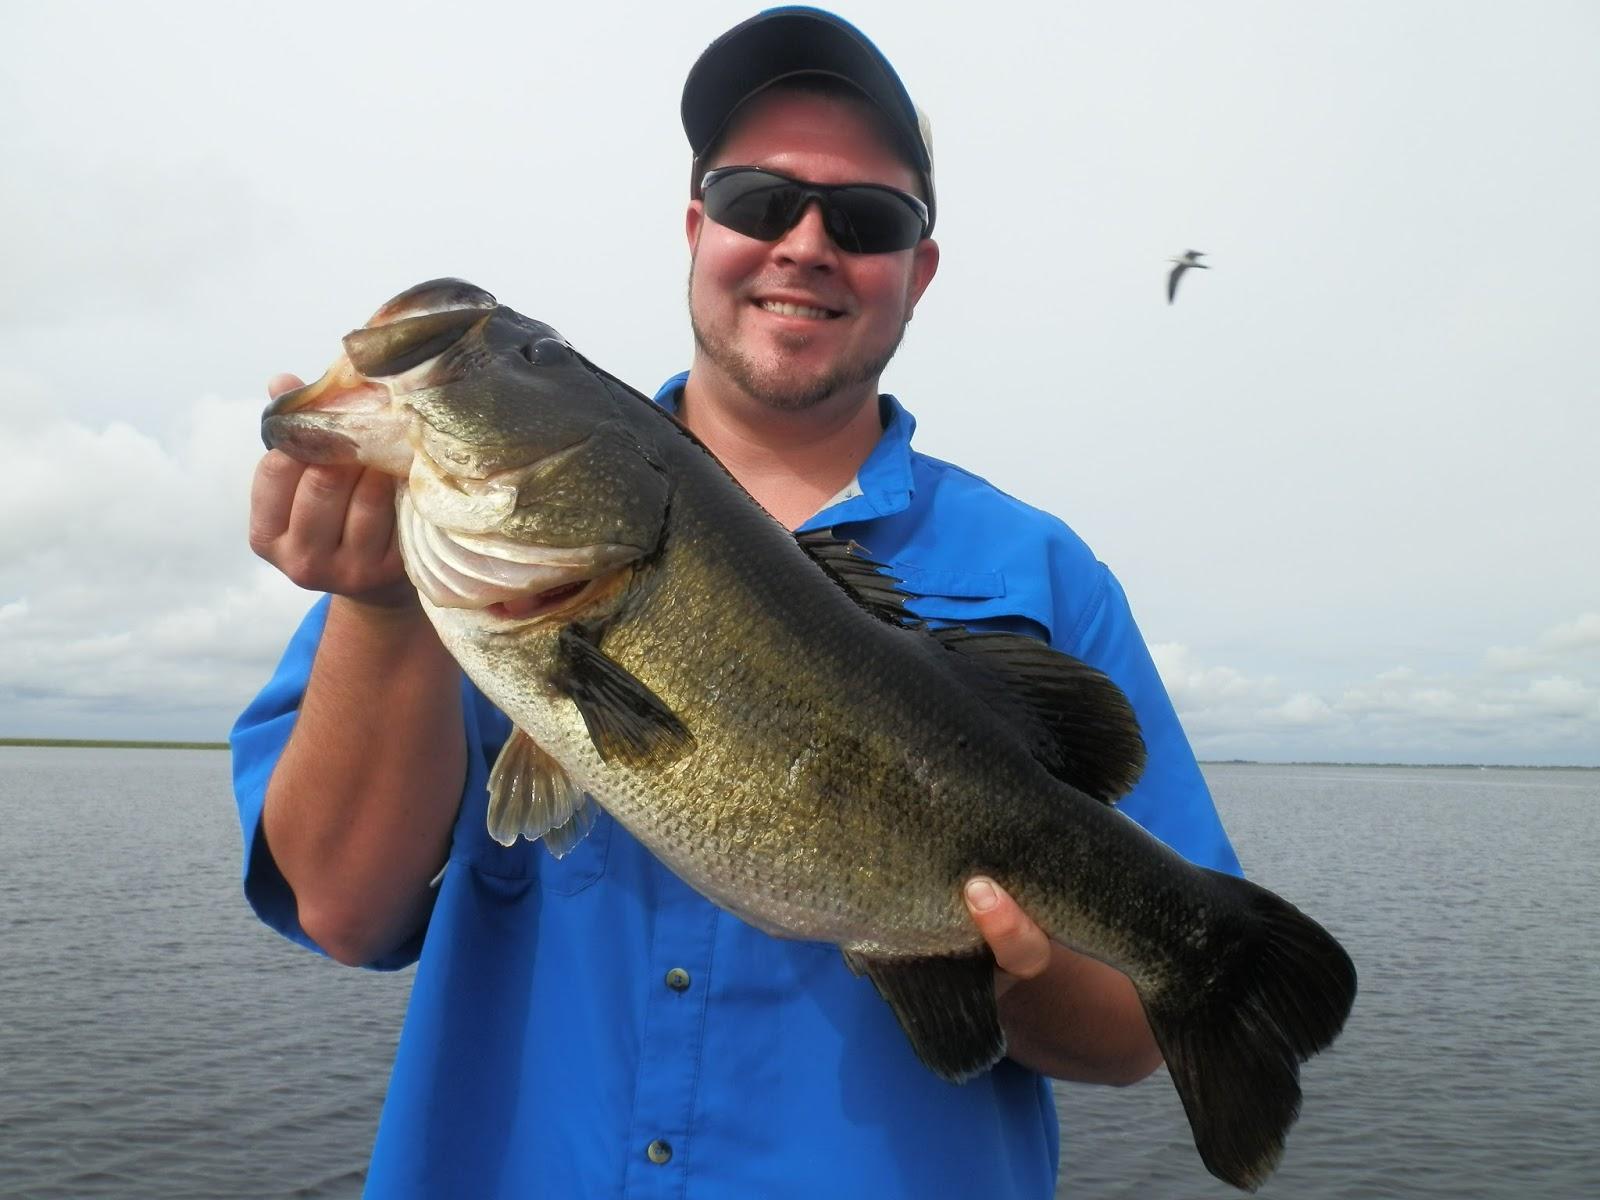 4 big bass in one morning lake okeechobee bass fishing for Big bass fishing